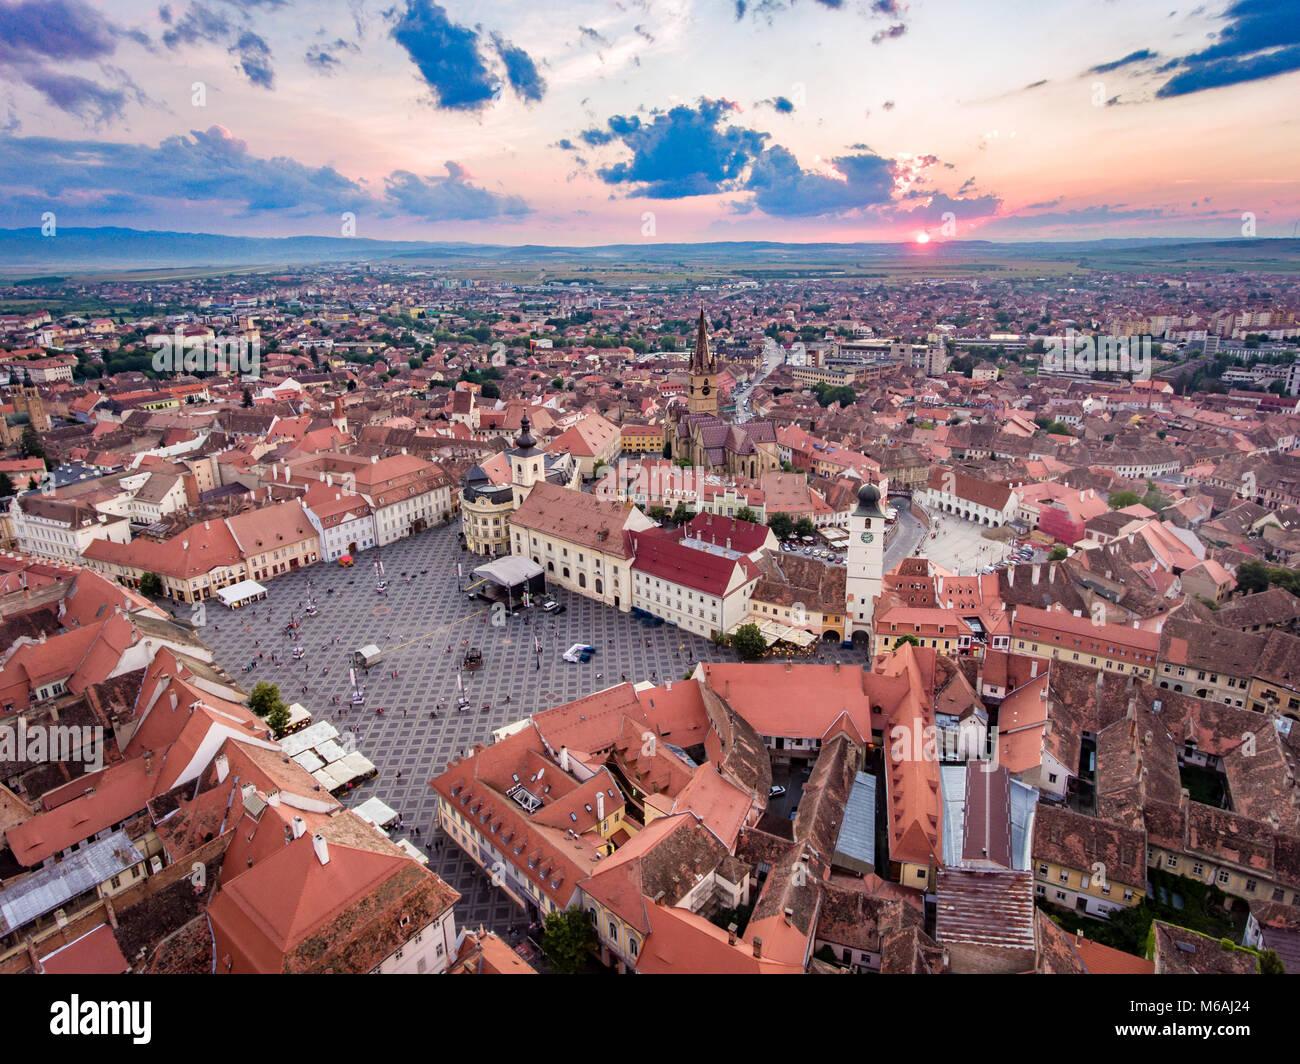 Aerial view of Sibiu, Romania, at sunset - Stock Image